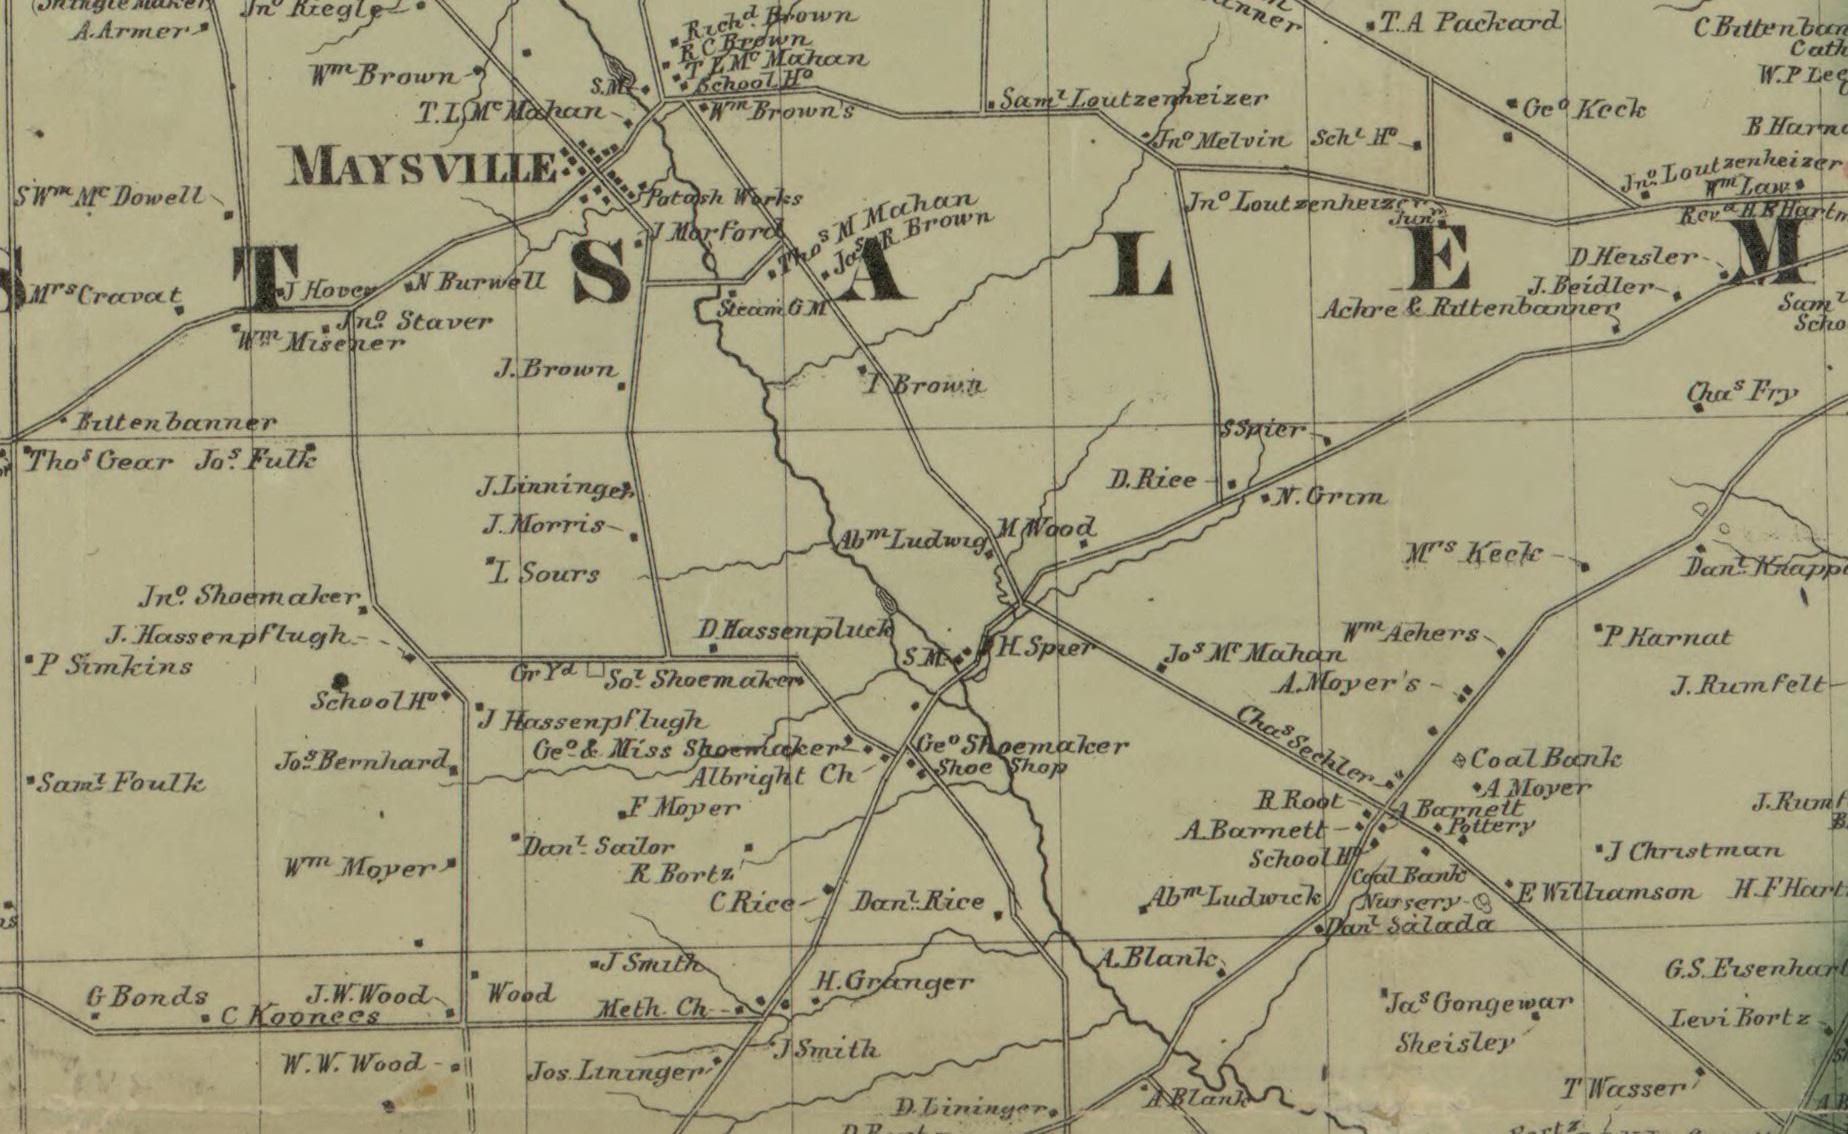 West Salem showing Woods family farm in 1860